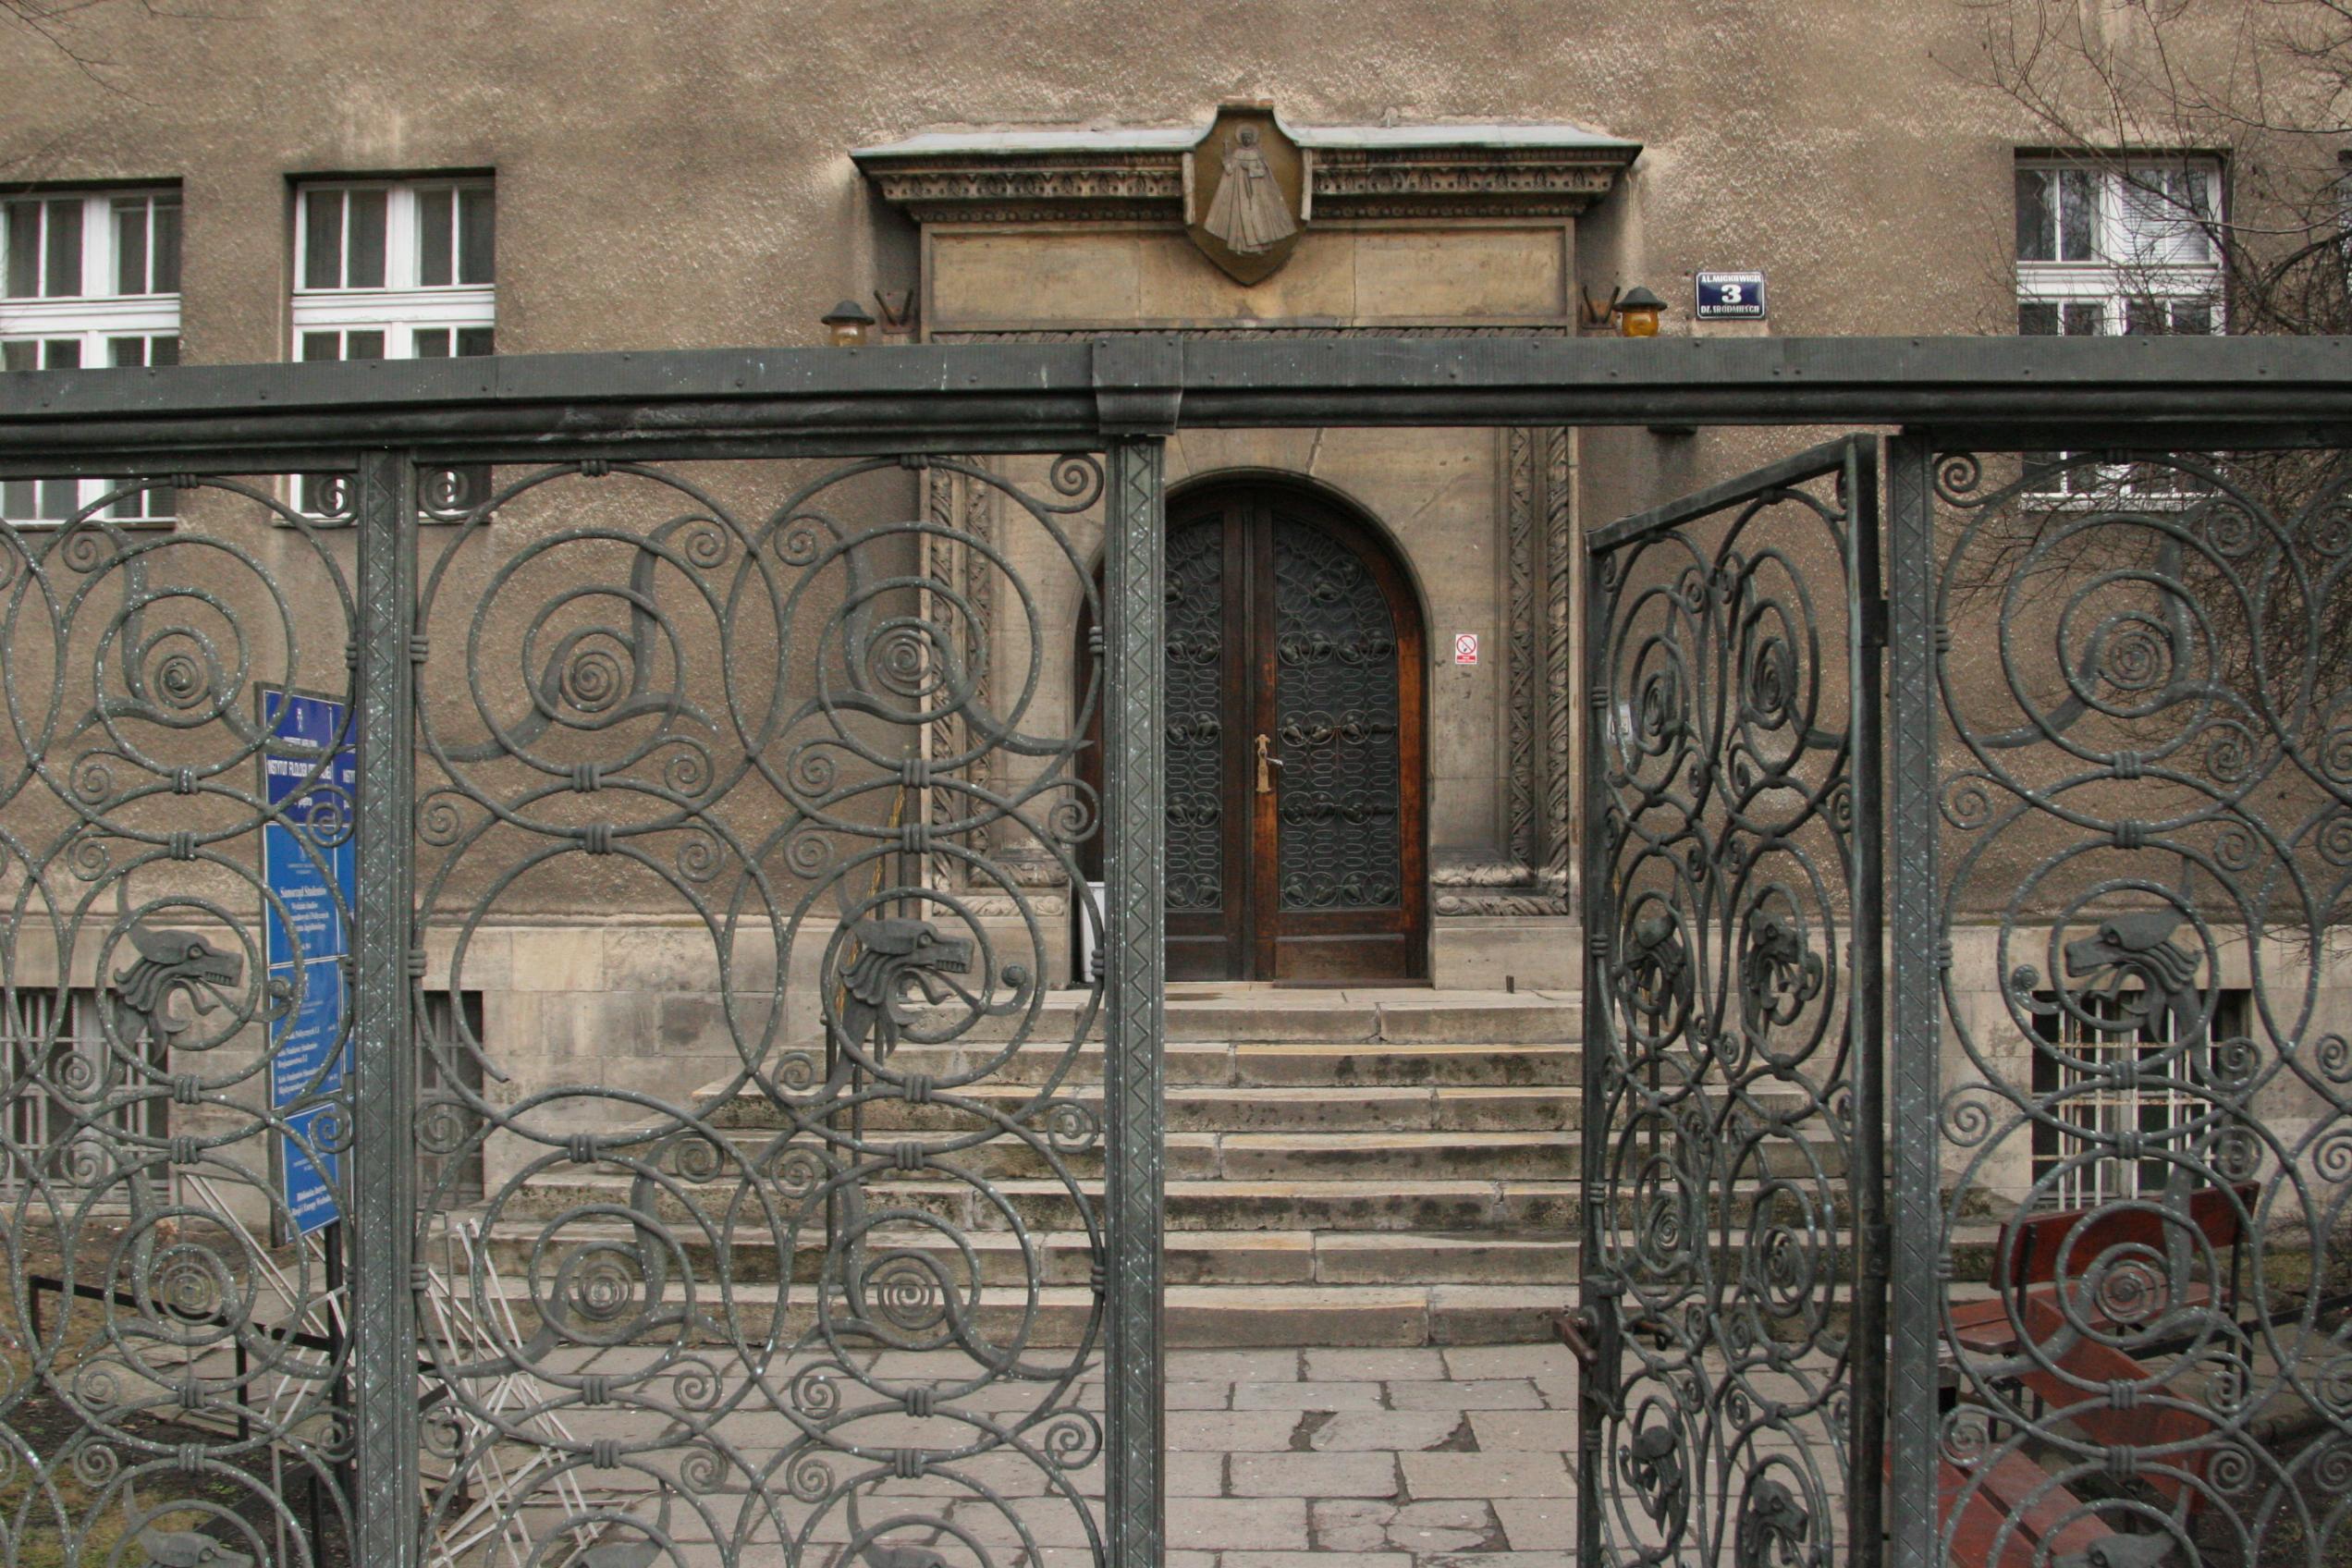 by Alexander Baranov - . (6858191034).jpg Krakow - February 2012 Date 22 March 2012, 02:22 Source . Author Alexander Baranov from Montpellier, France